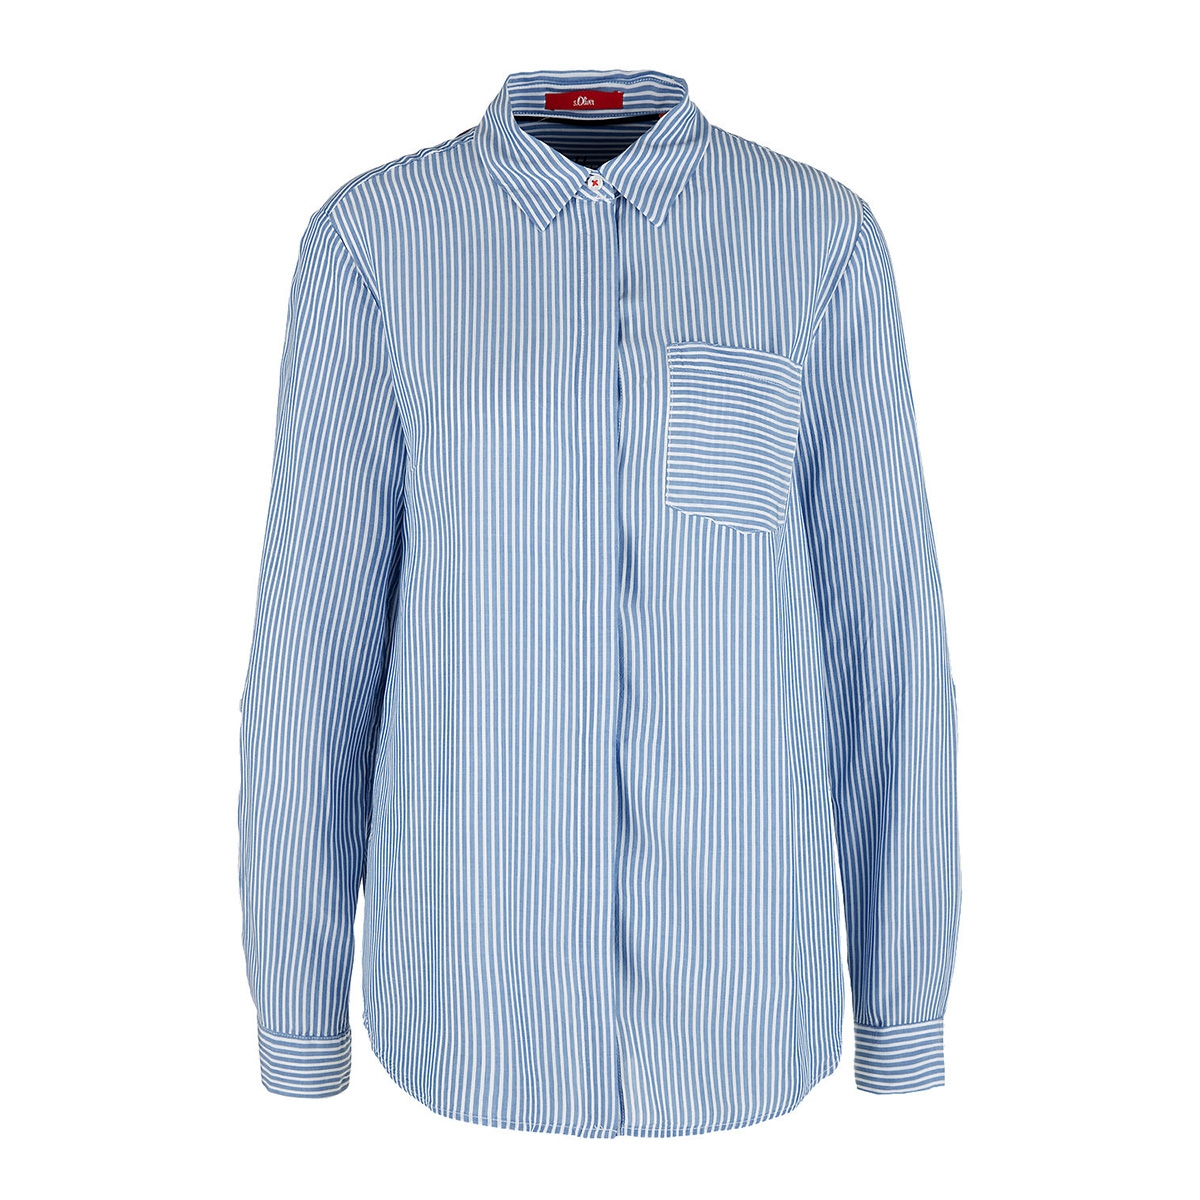 blouse met borstzak 04899112876 s.oliver blouse 53g8